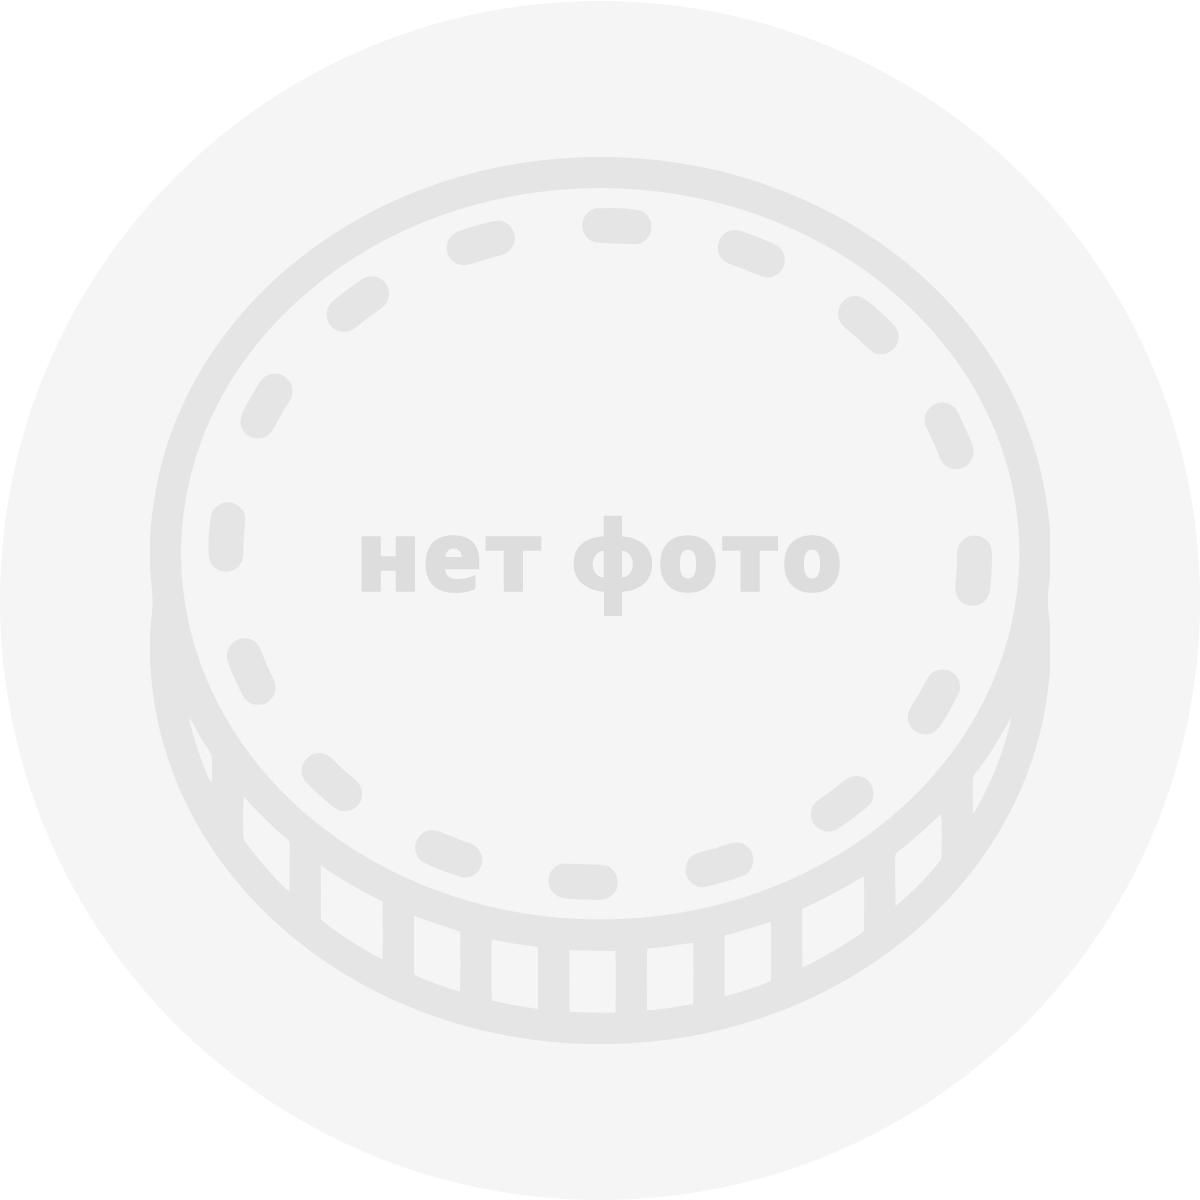 Французский Индокитай, 1/2 цента (1935 г.)